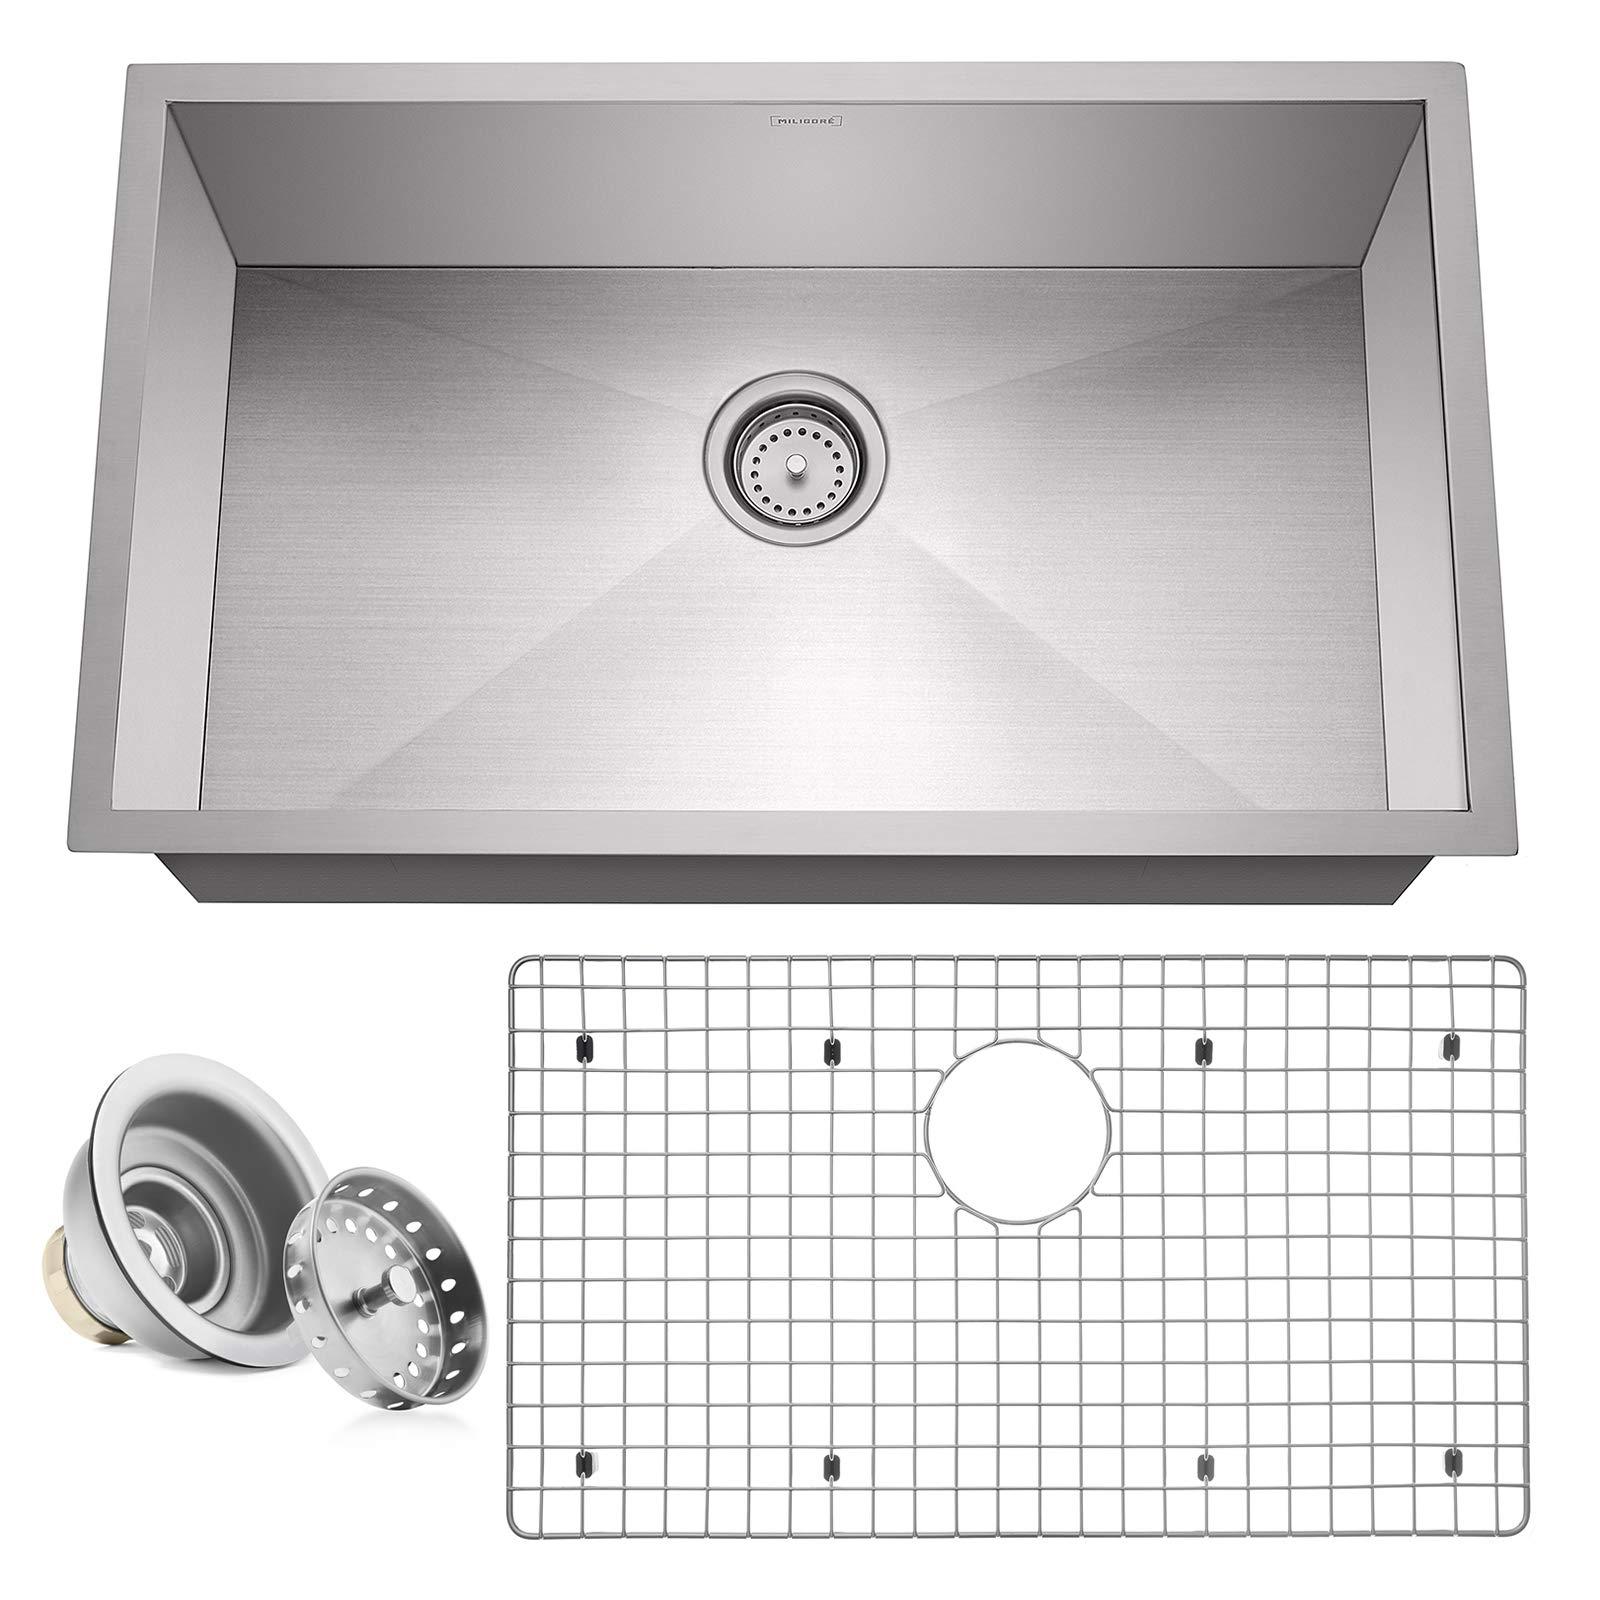 Miligore 30'' x 18'' x 10'' Deep Single Bowl Undermount Zero Radius 16-Gauge Stainless Steel Kitchen Sink - Includes Drain/Grid